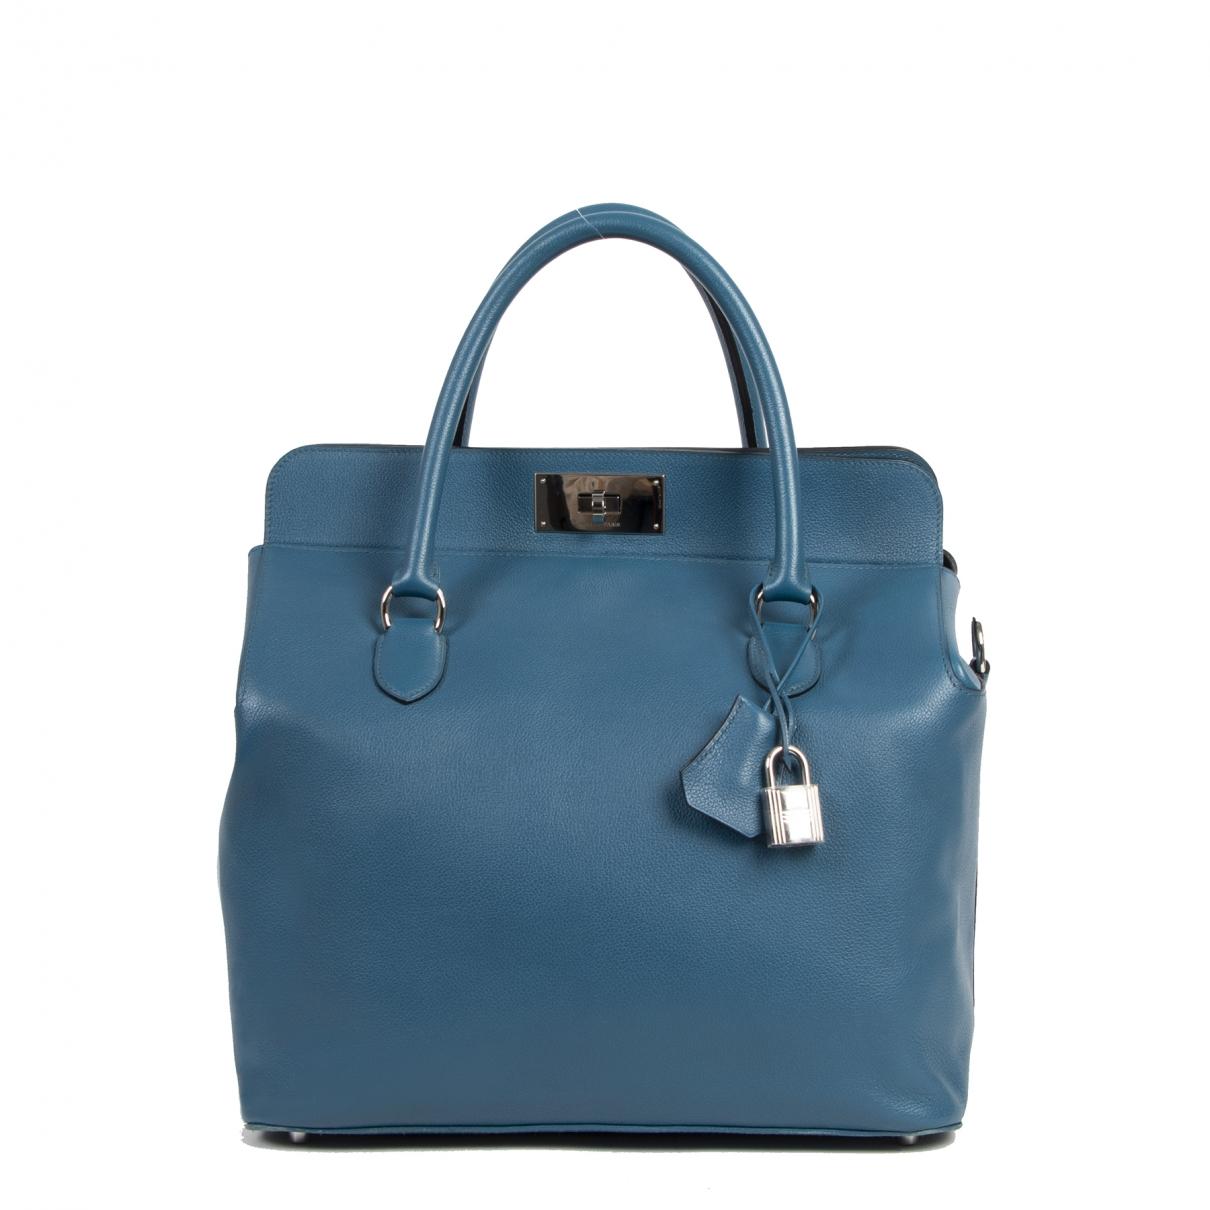 Hermes - Sac a main Toolbox pour femme en cuir - bleu